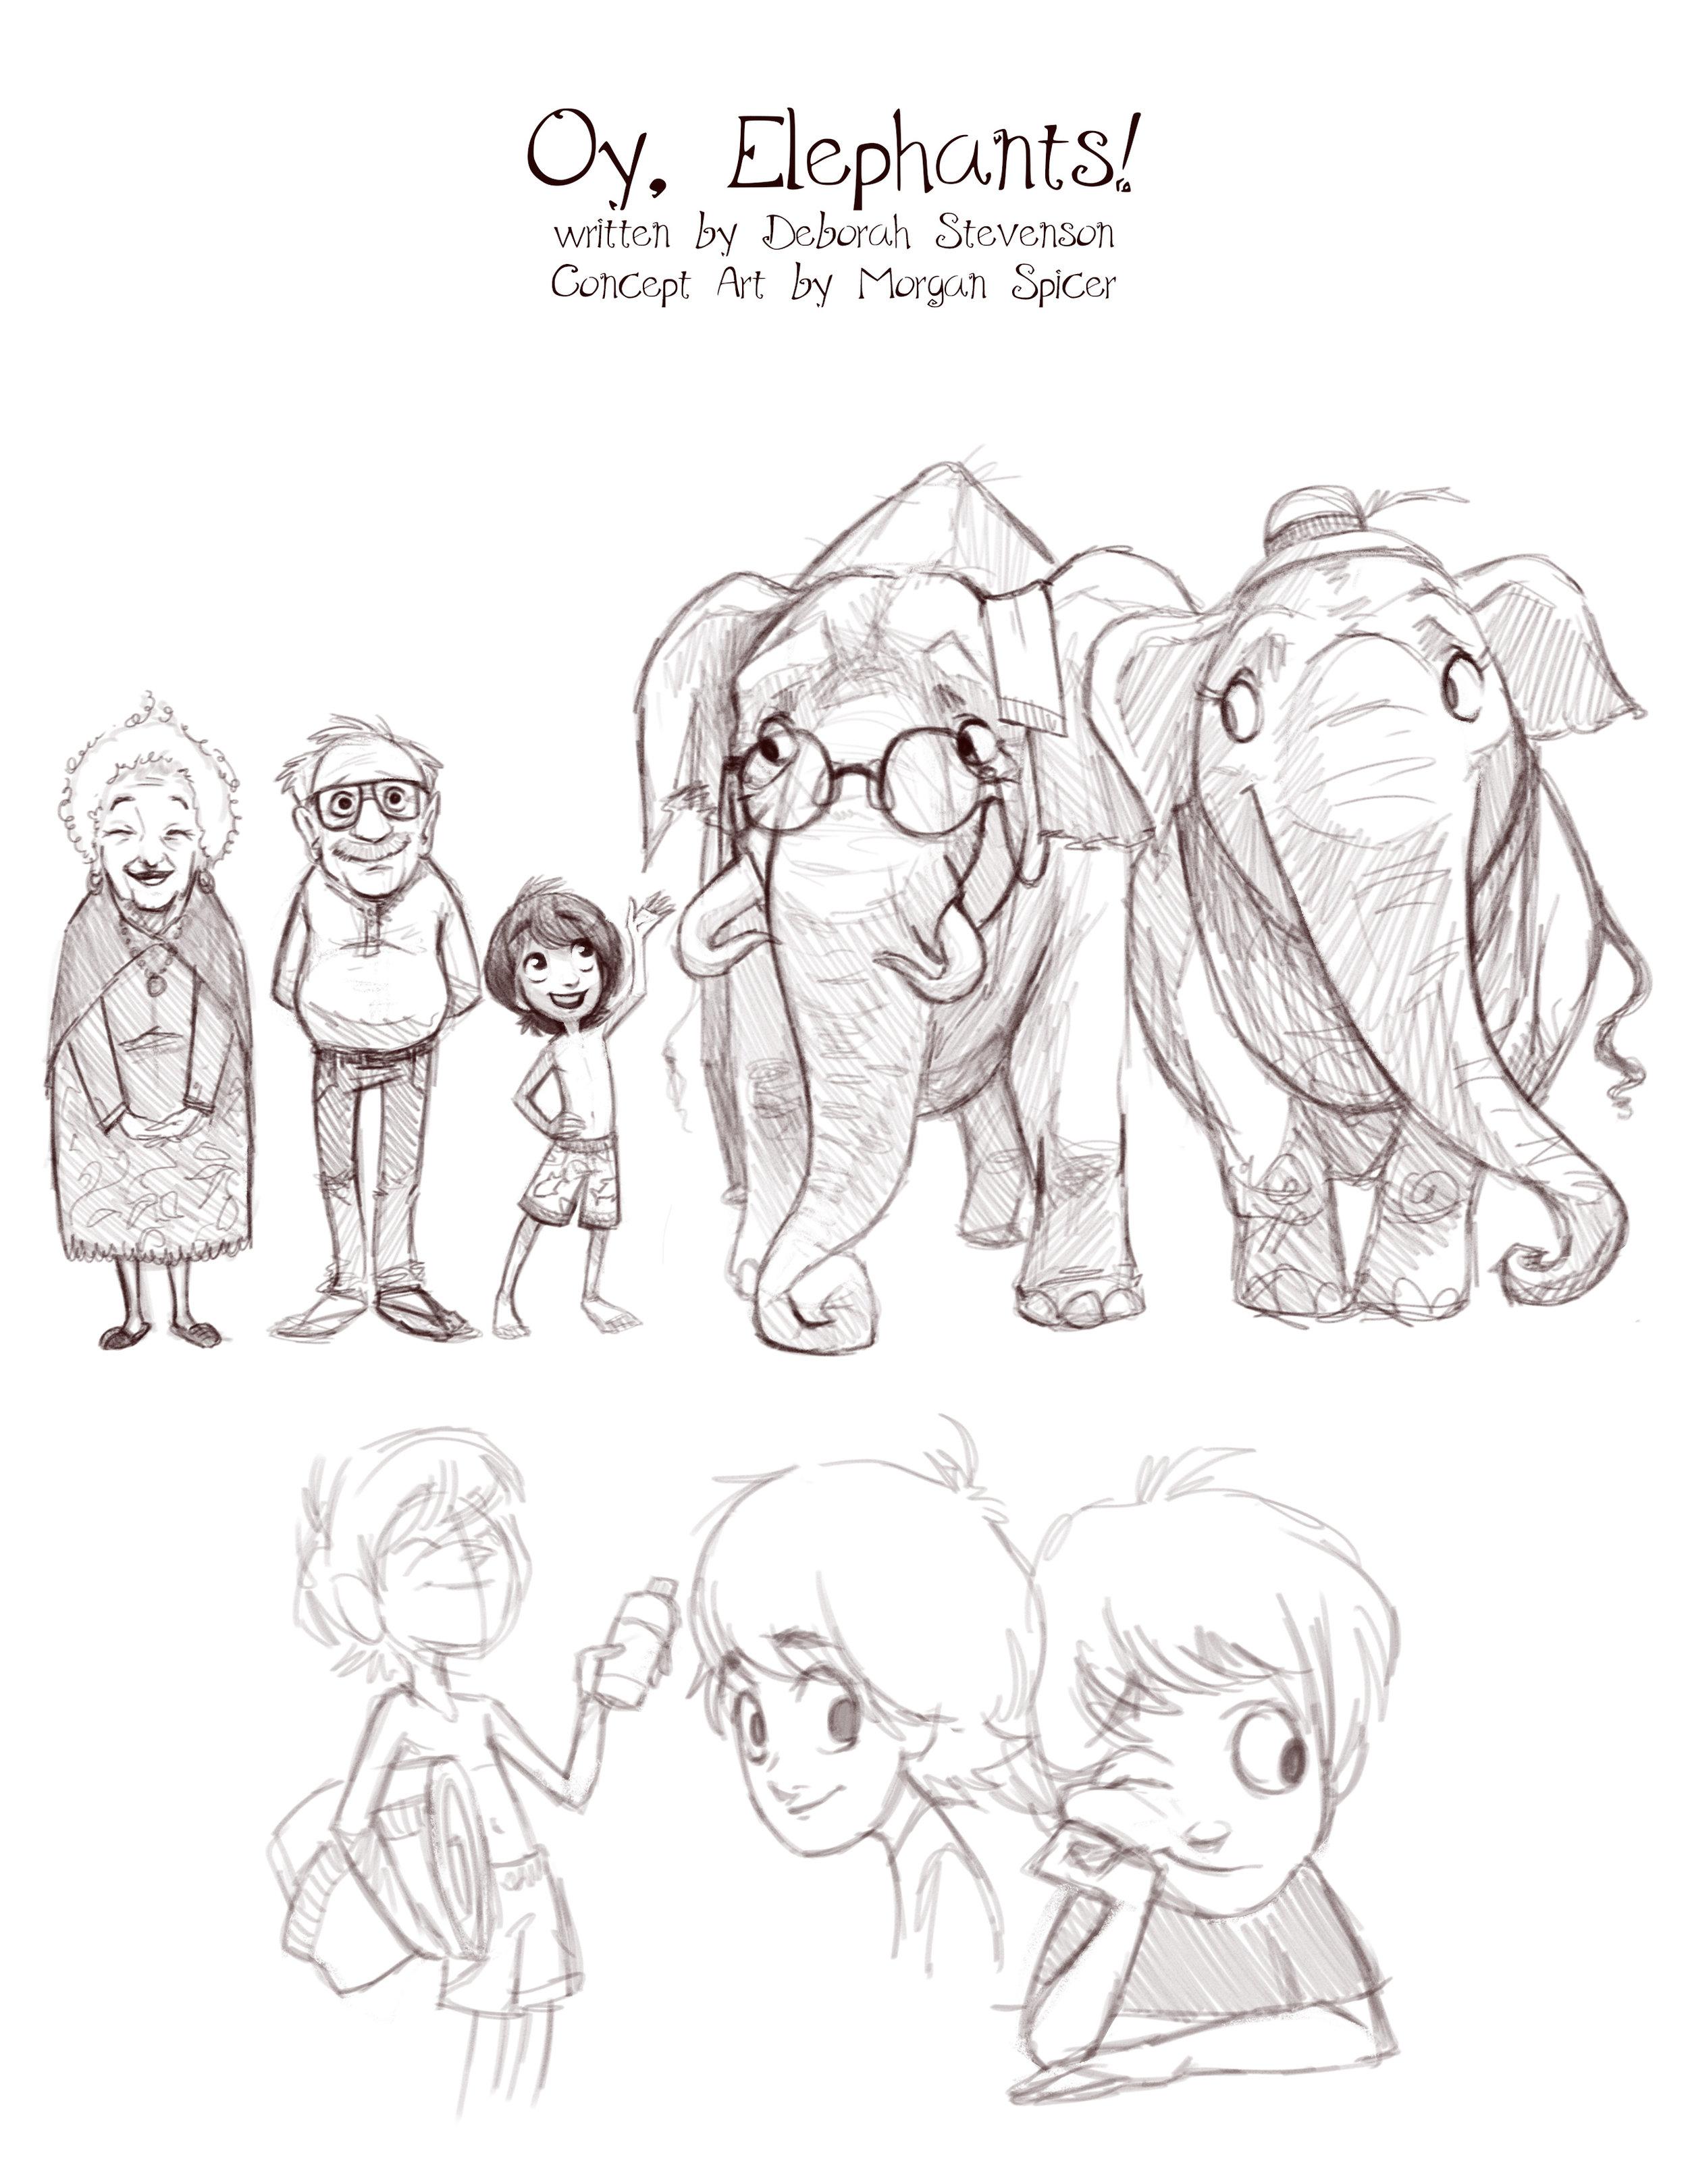 Concept art for Oy, Elephants! (c) Morgan Spicer